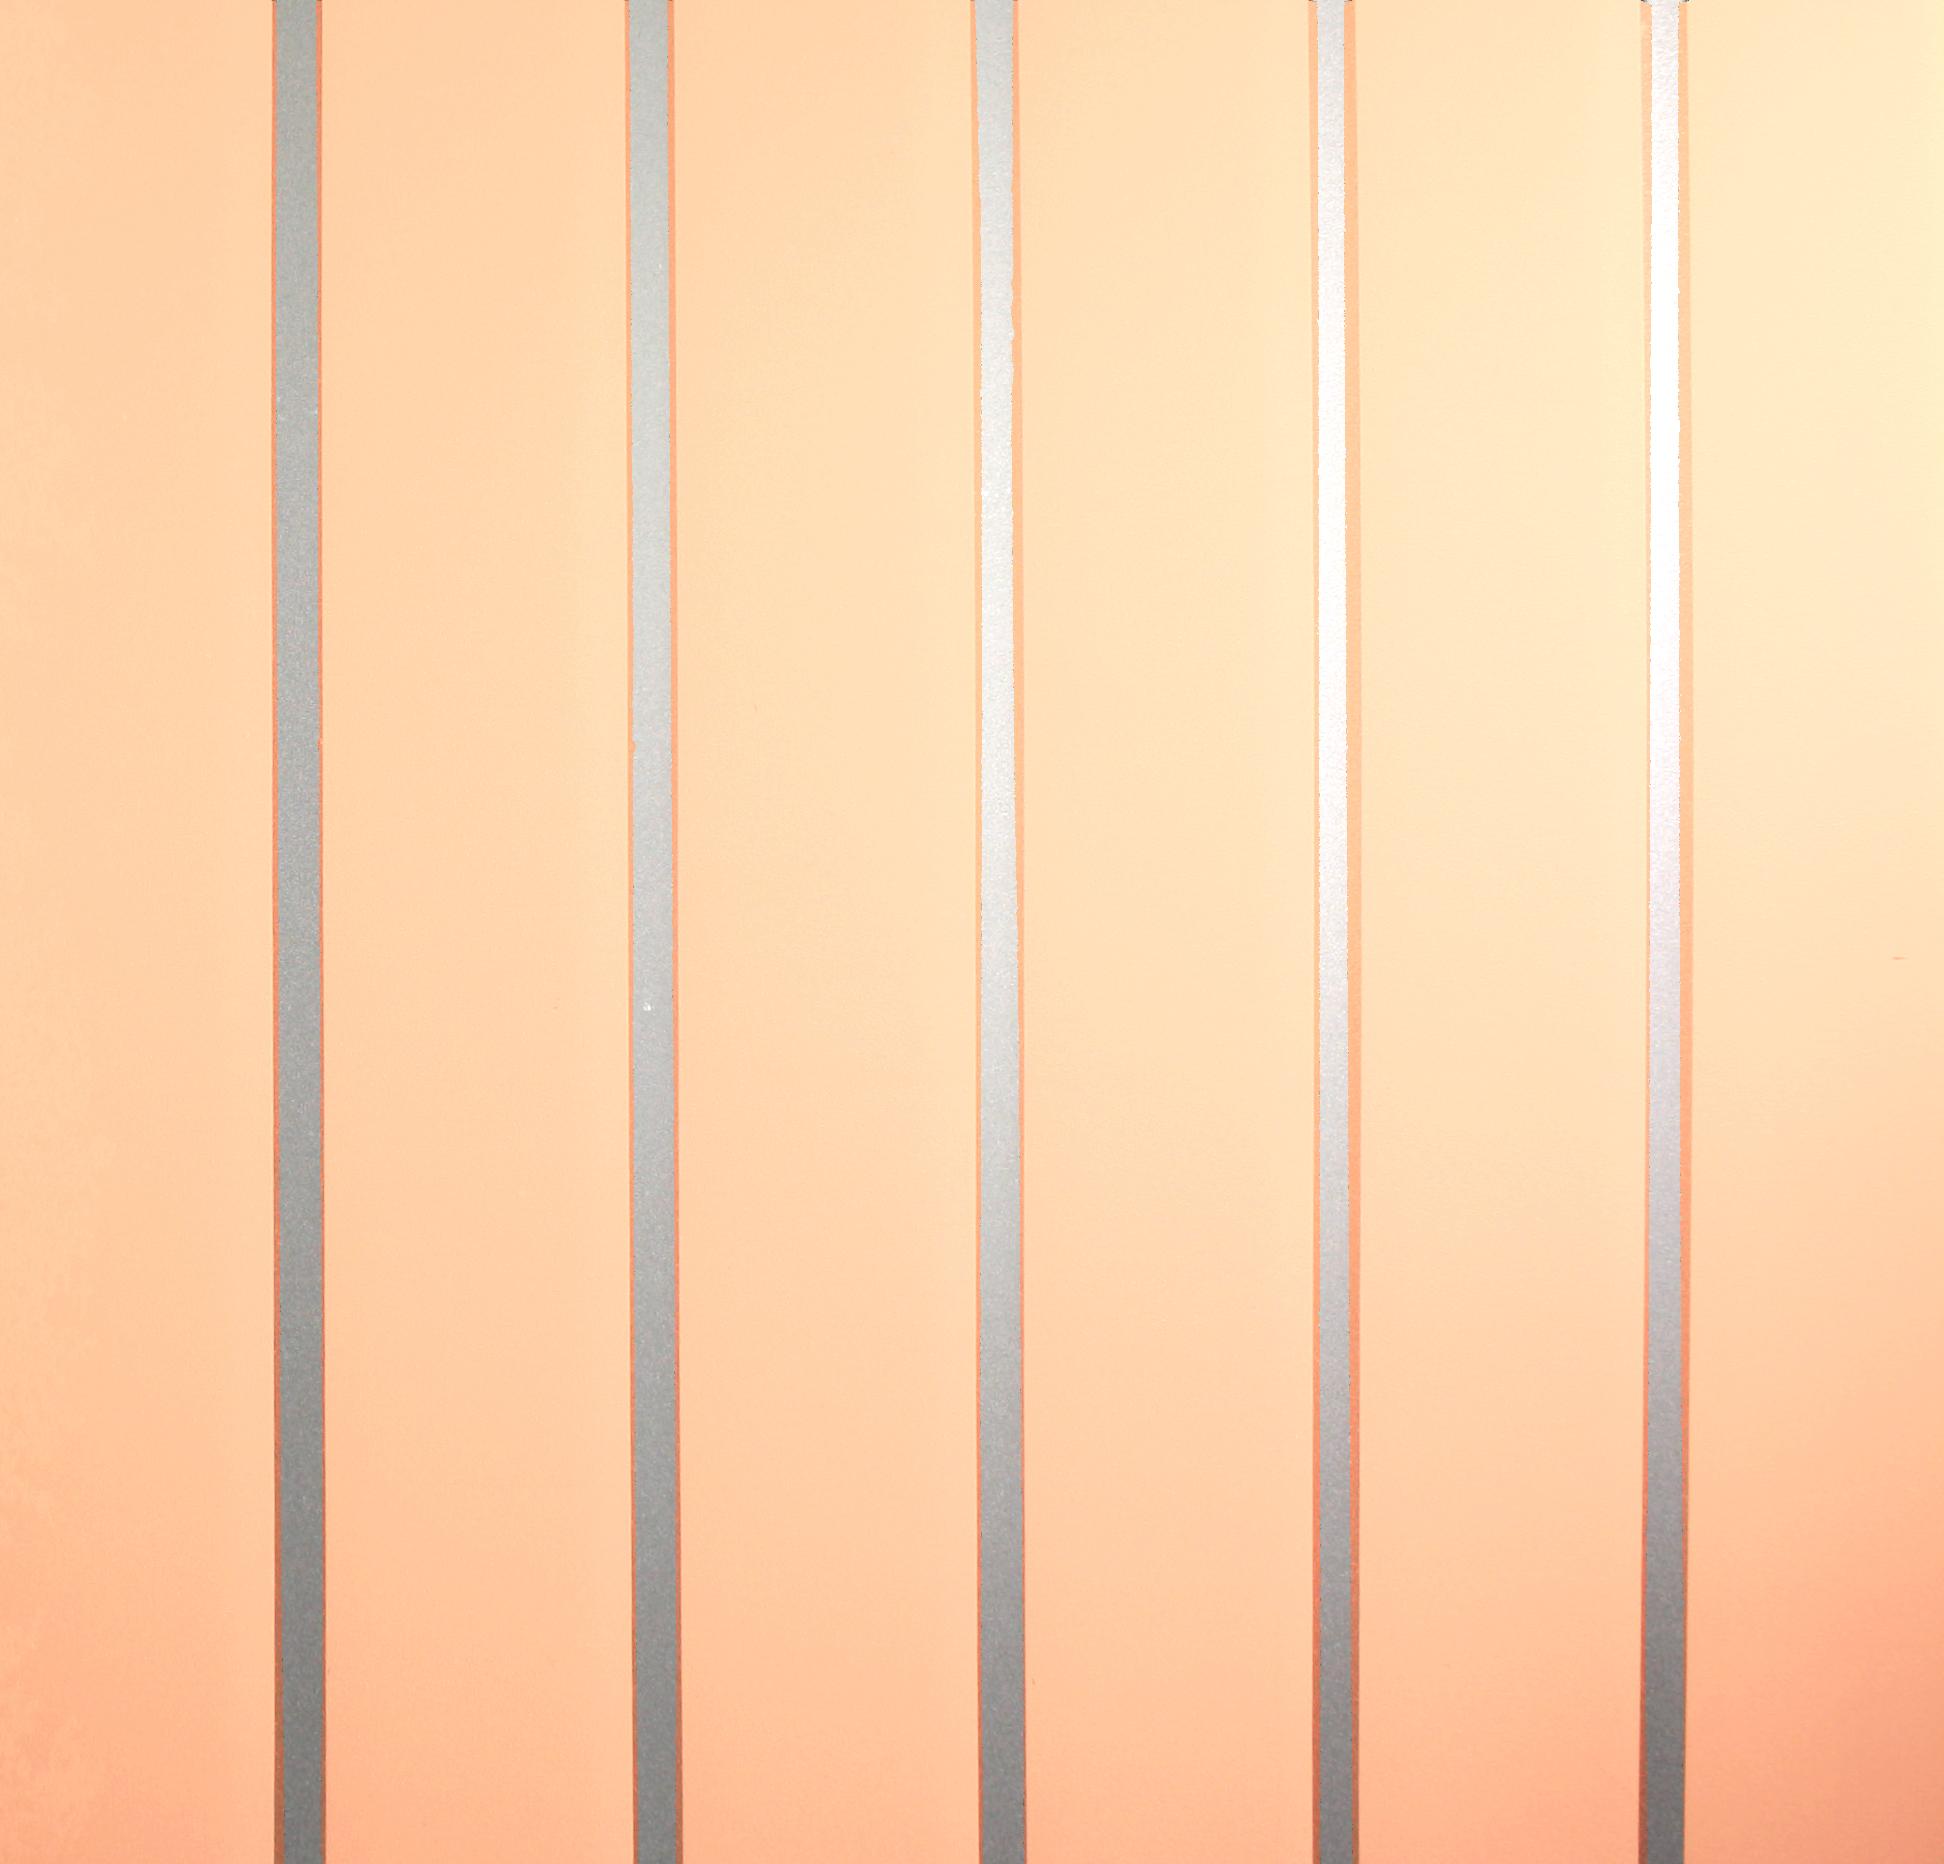 Vertical Line Design : Decorative vertical line pixshark images